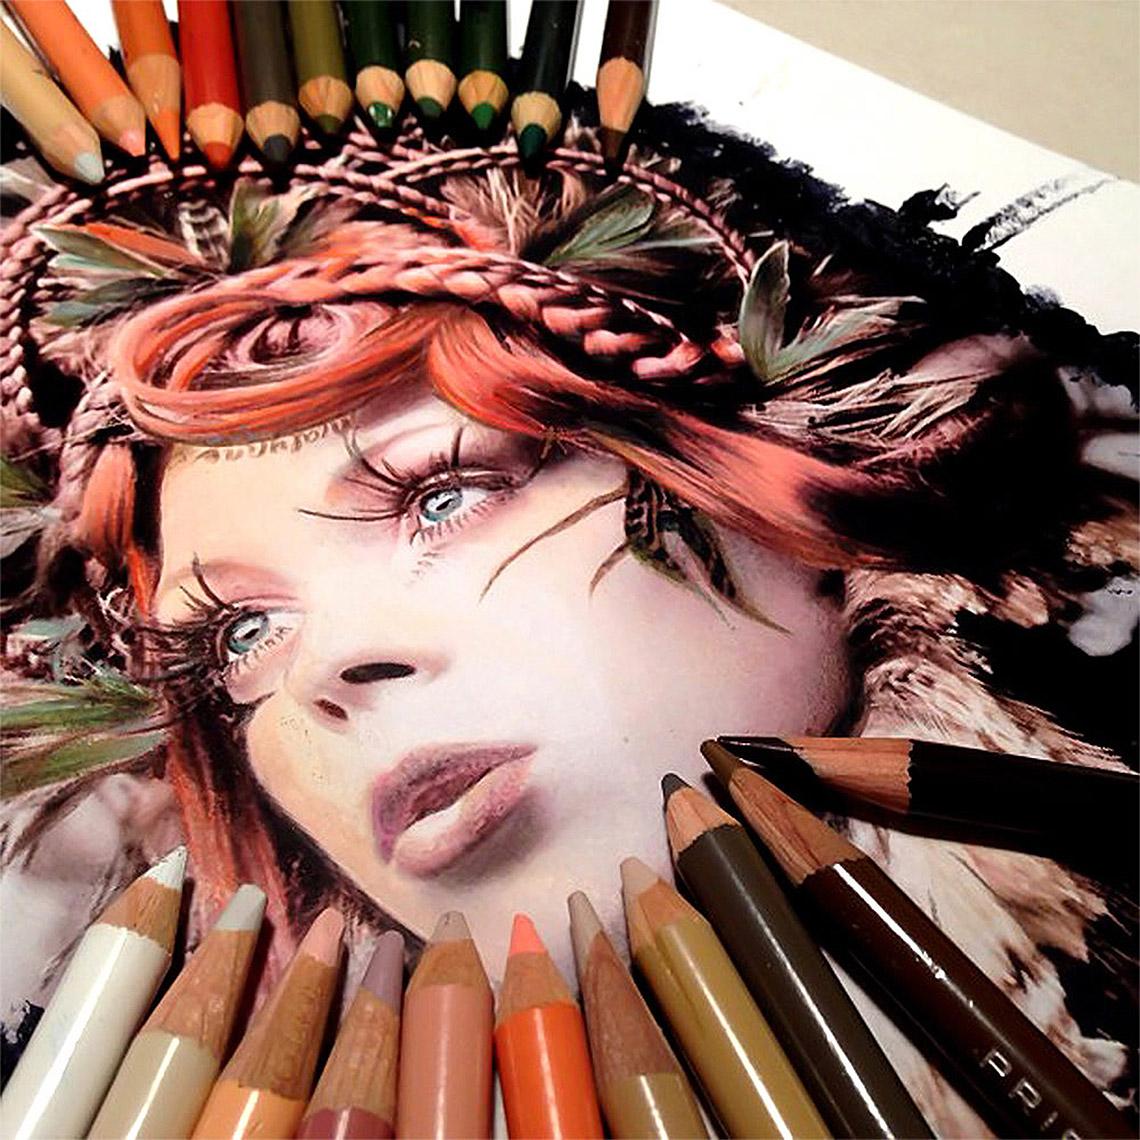 lifelike-illustrations-karla-mialynne-09